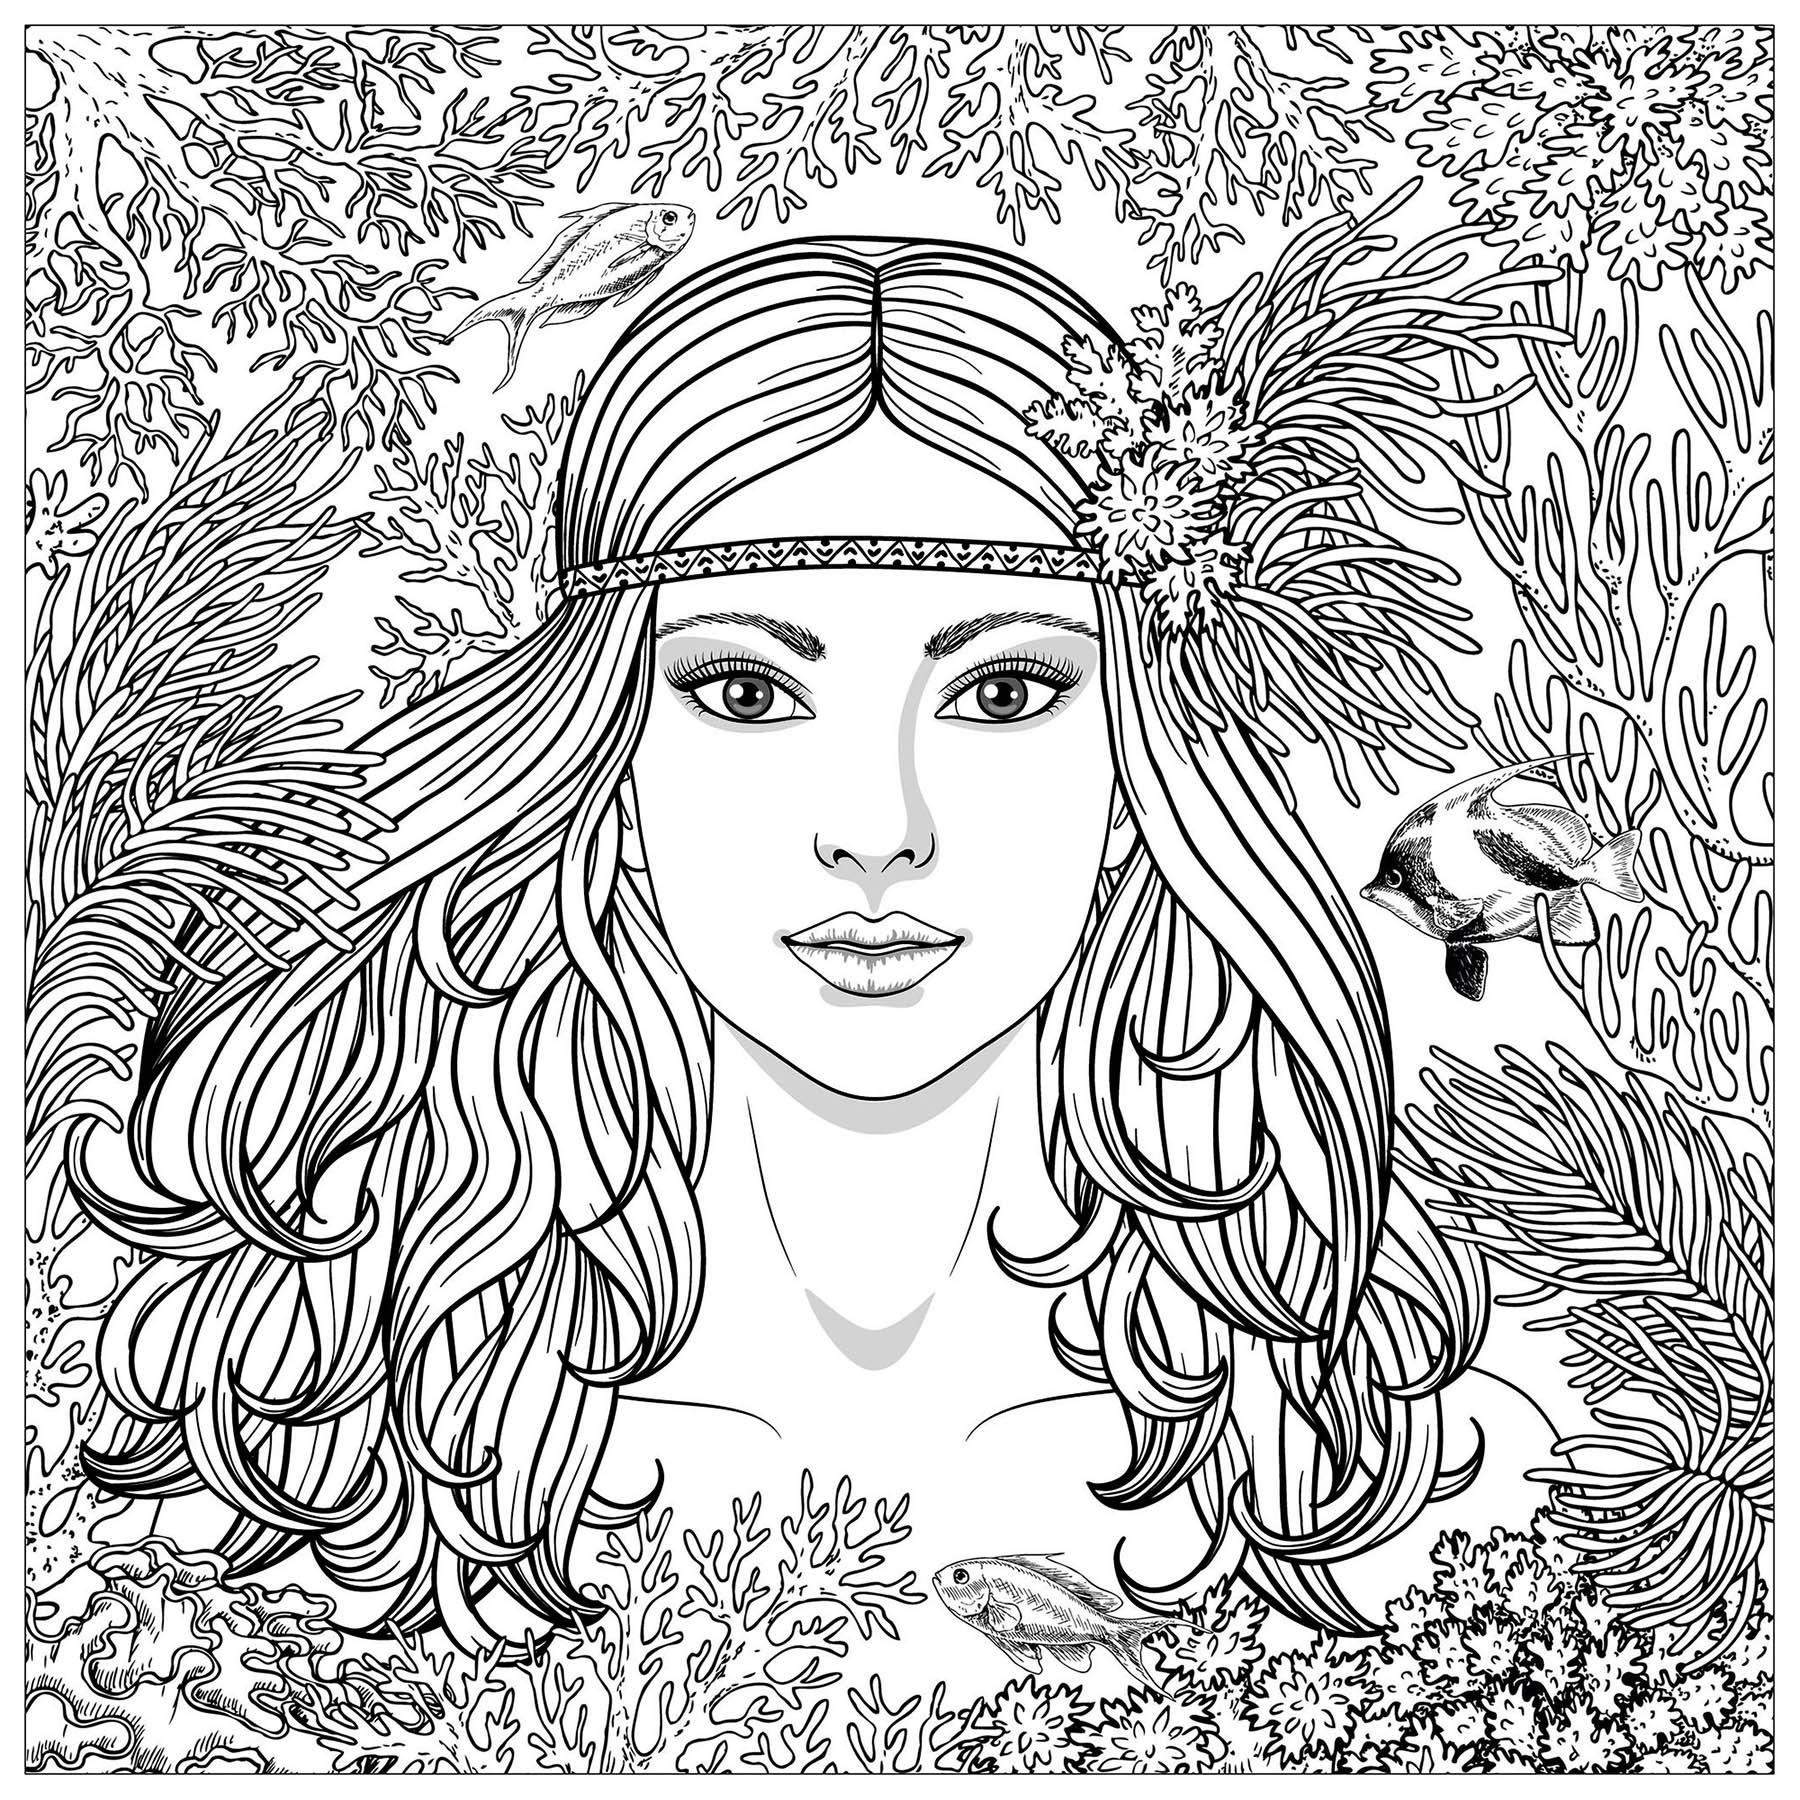 Meerjungfrauen 26920 Meerjungfrauen Malbuch Fur Erwachsene